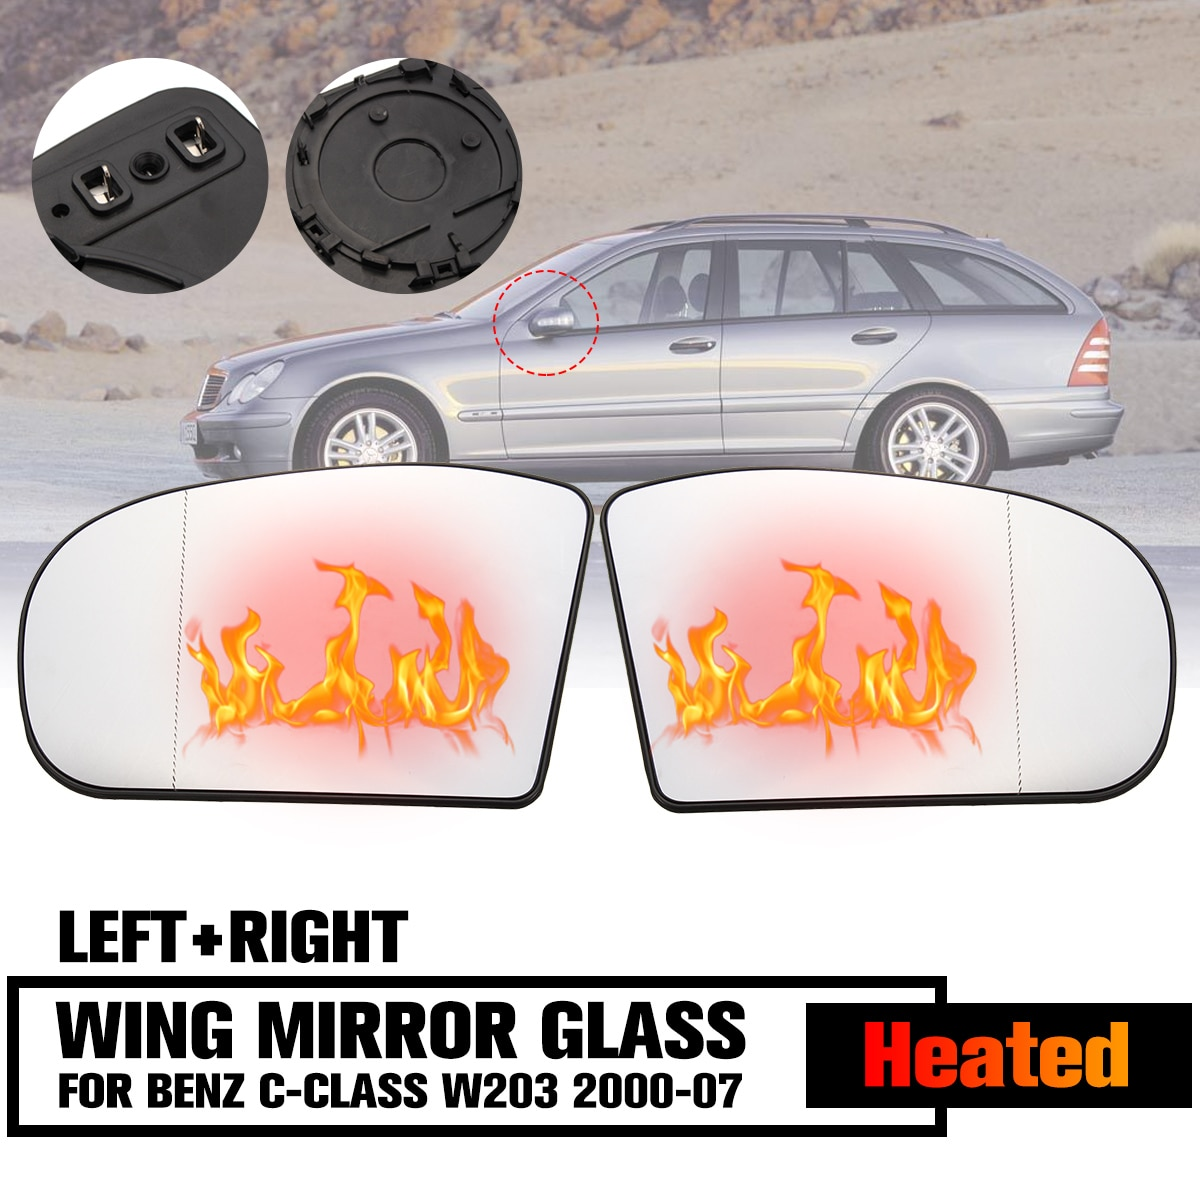 Door Wing Mirror Glass Heated Wide Angle Left Right Side For Benz C-Class W203 2000-2007 Saloon E-class W211 E320 E350 E500 E55